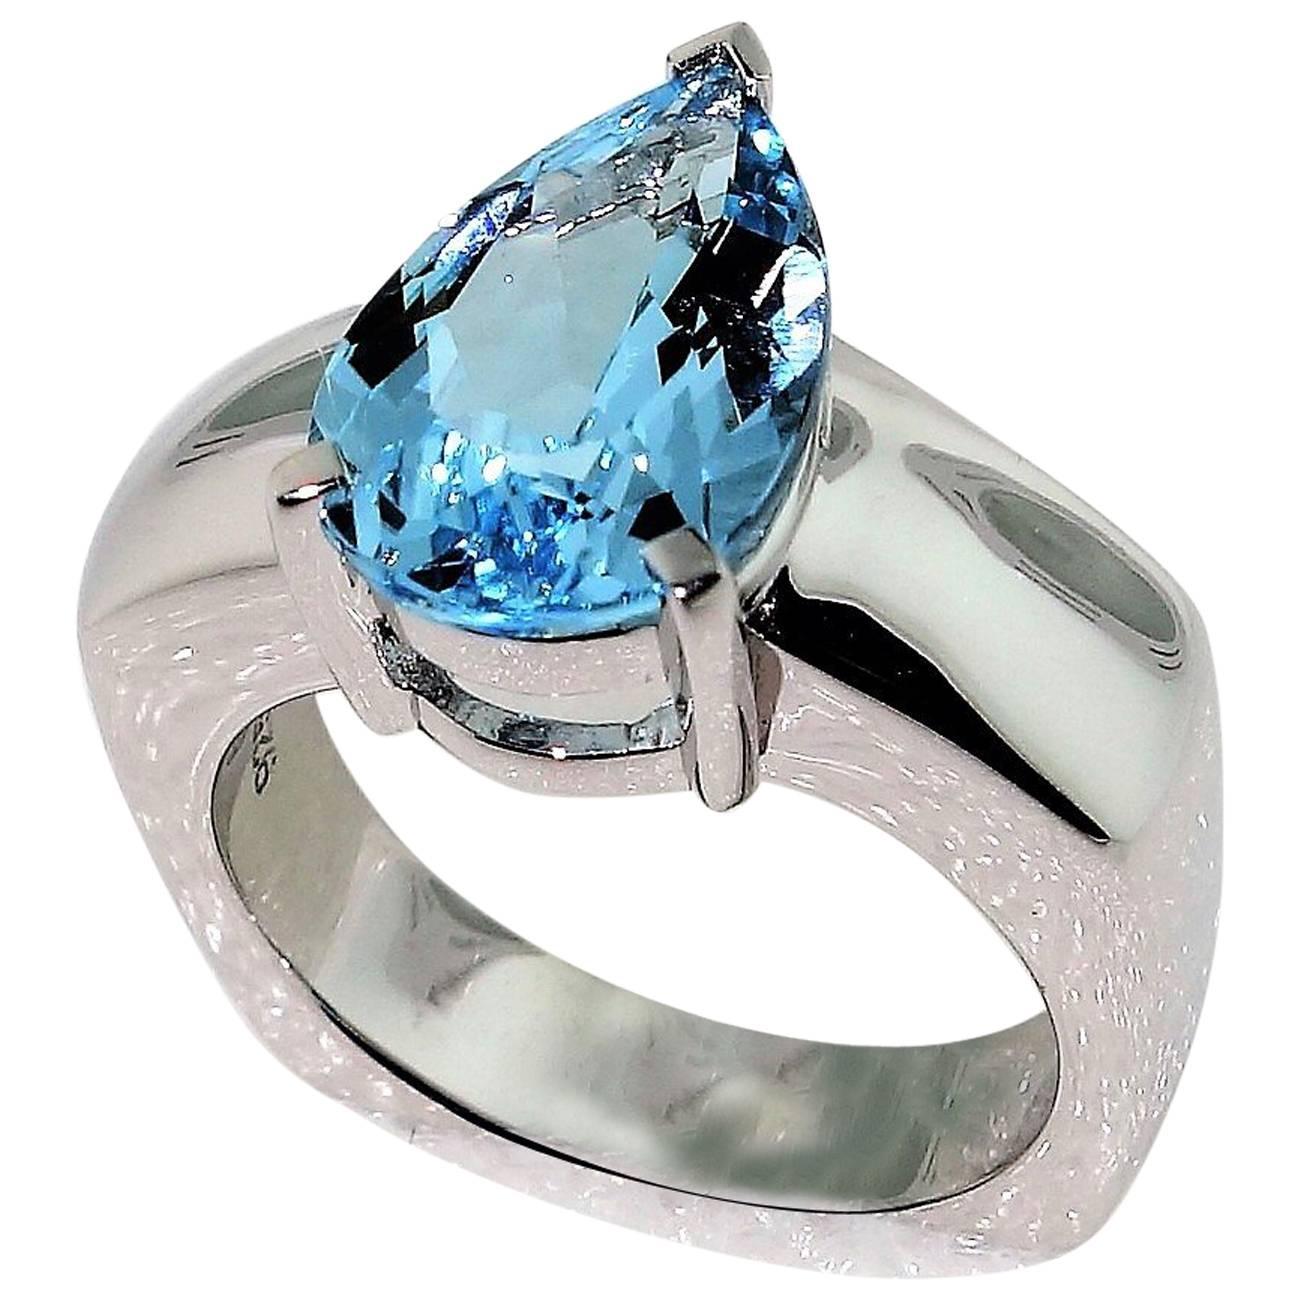 2.90 Carat Blue Topaz Diamond Solitaire Ring Estate Fine Jewelry